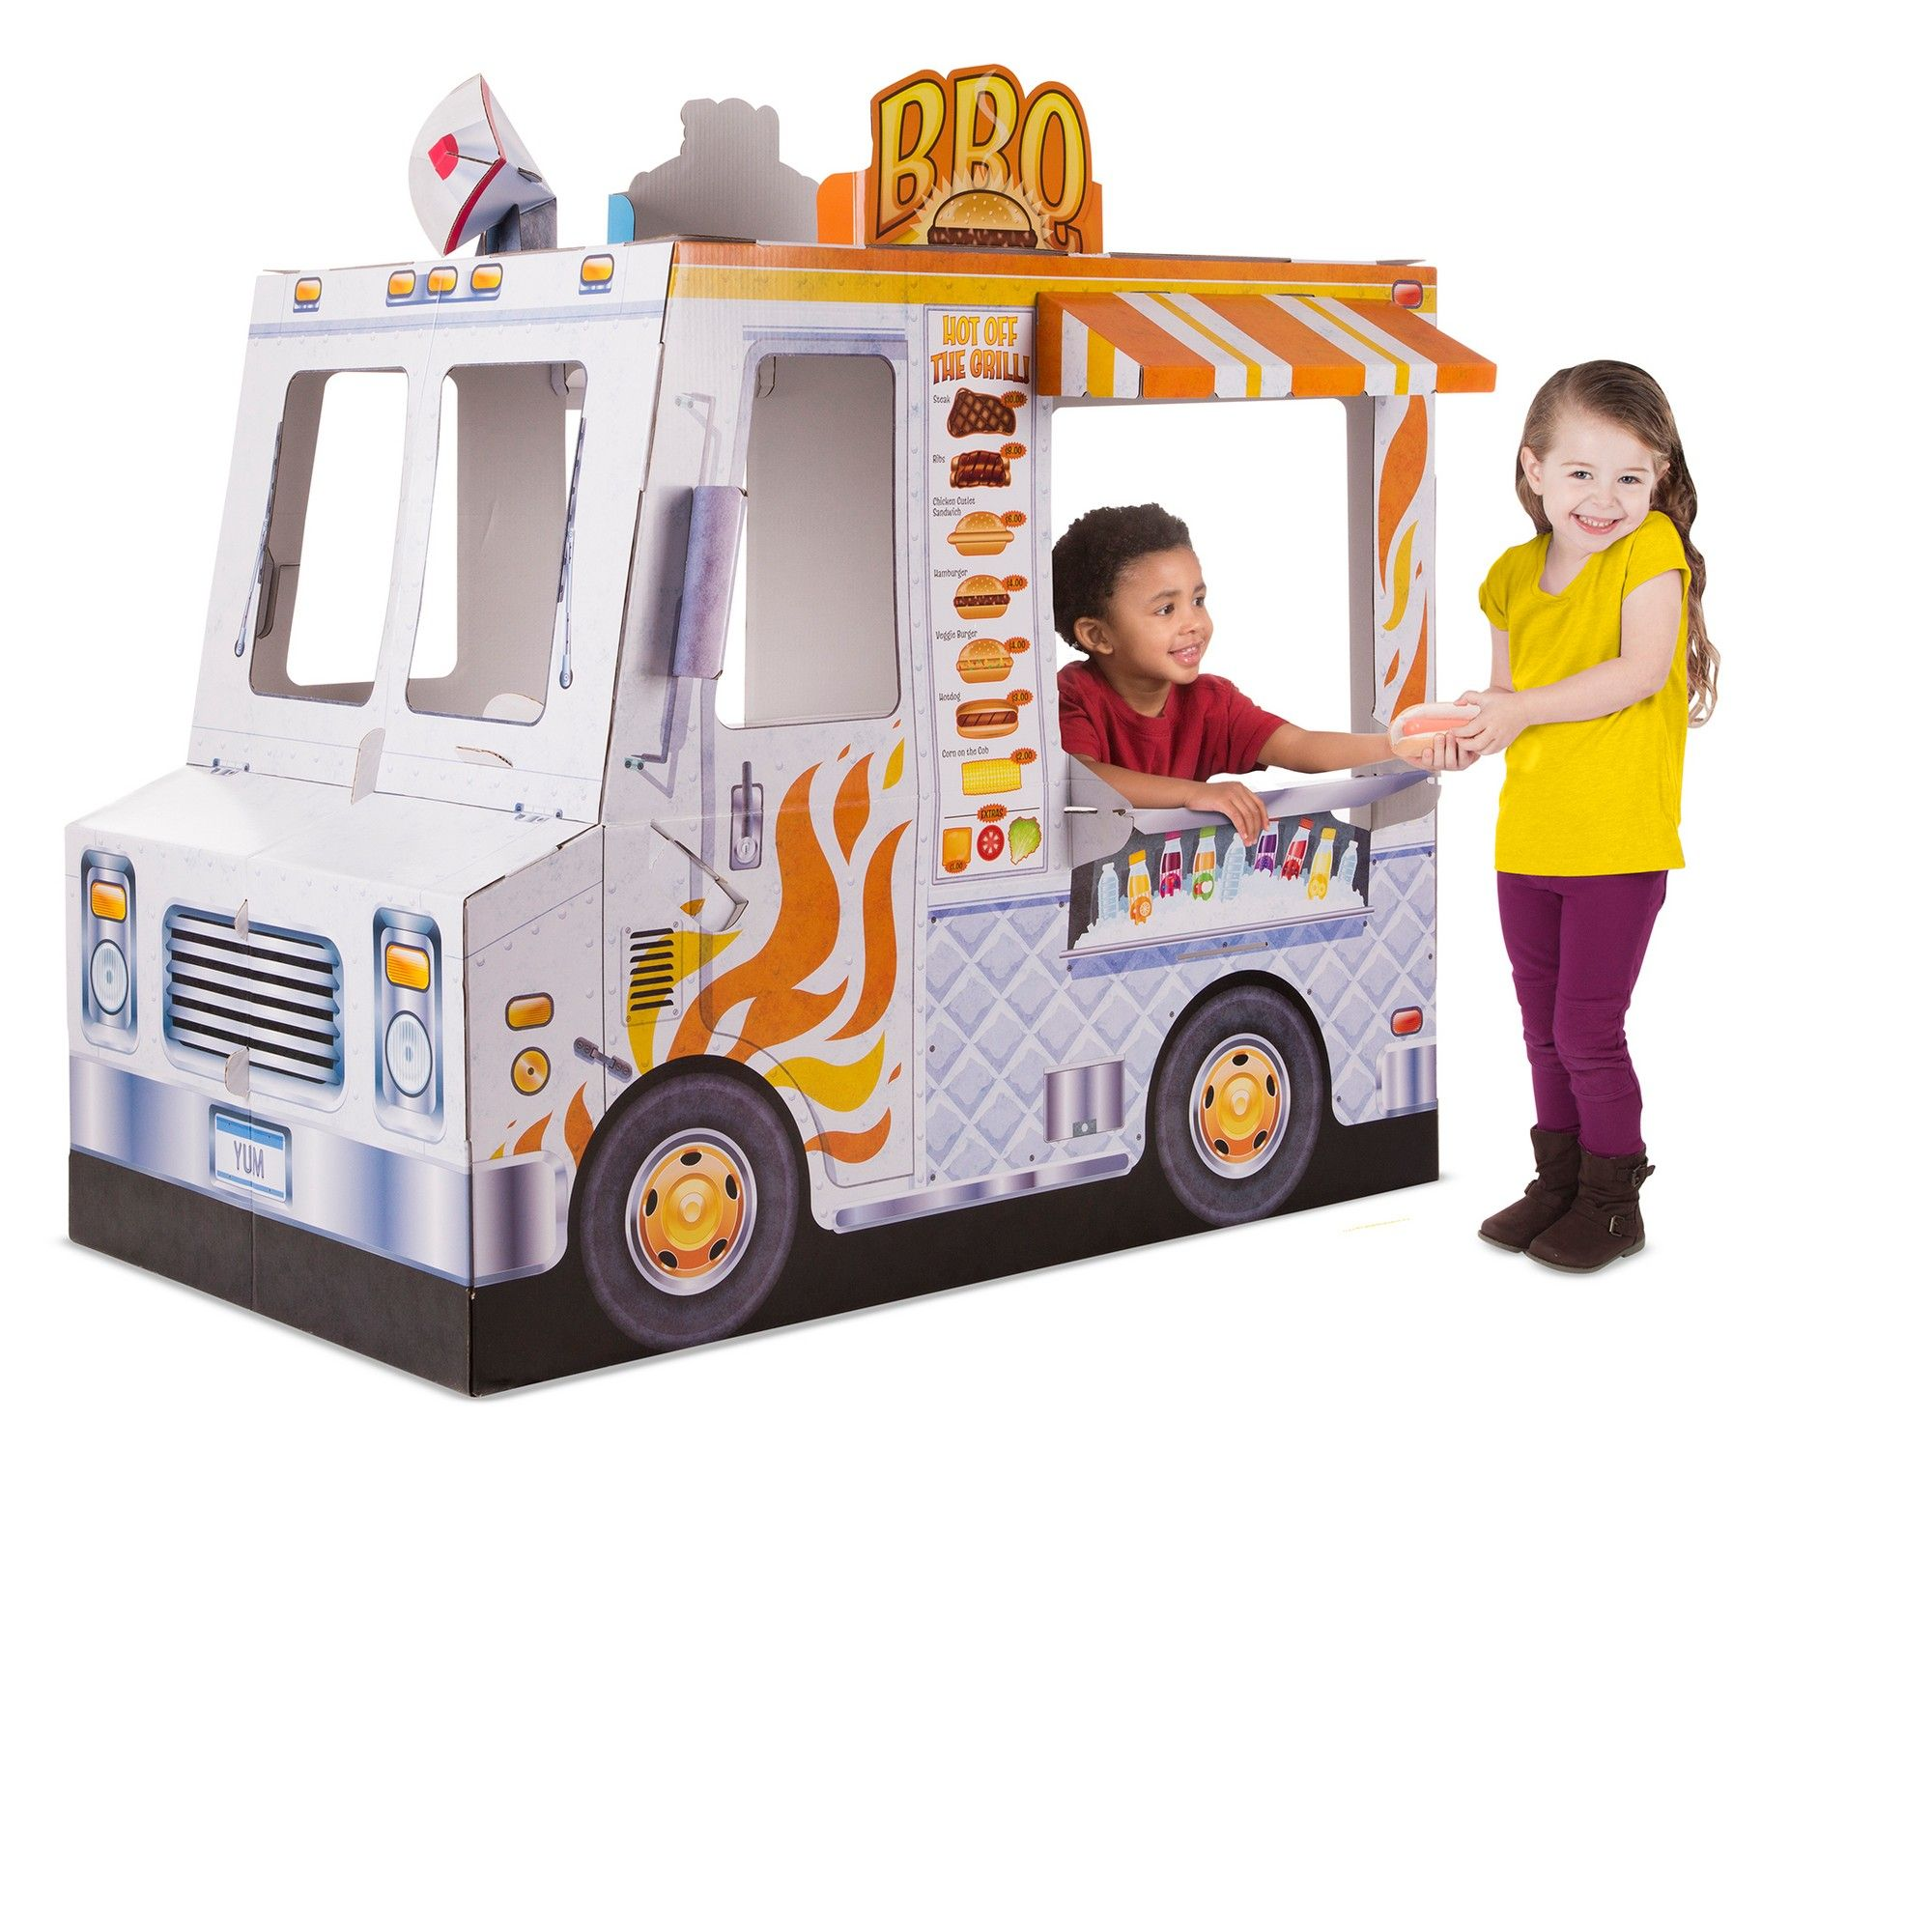 Melissa doug food truck indoor corrugate playhouse over